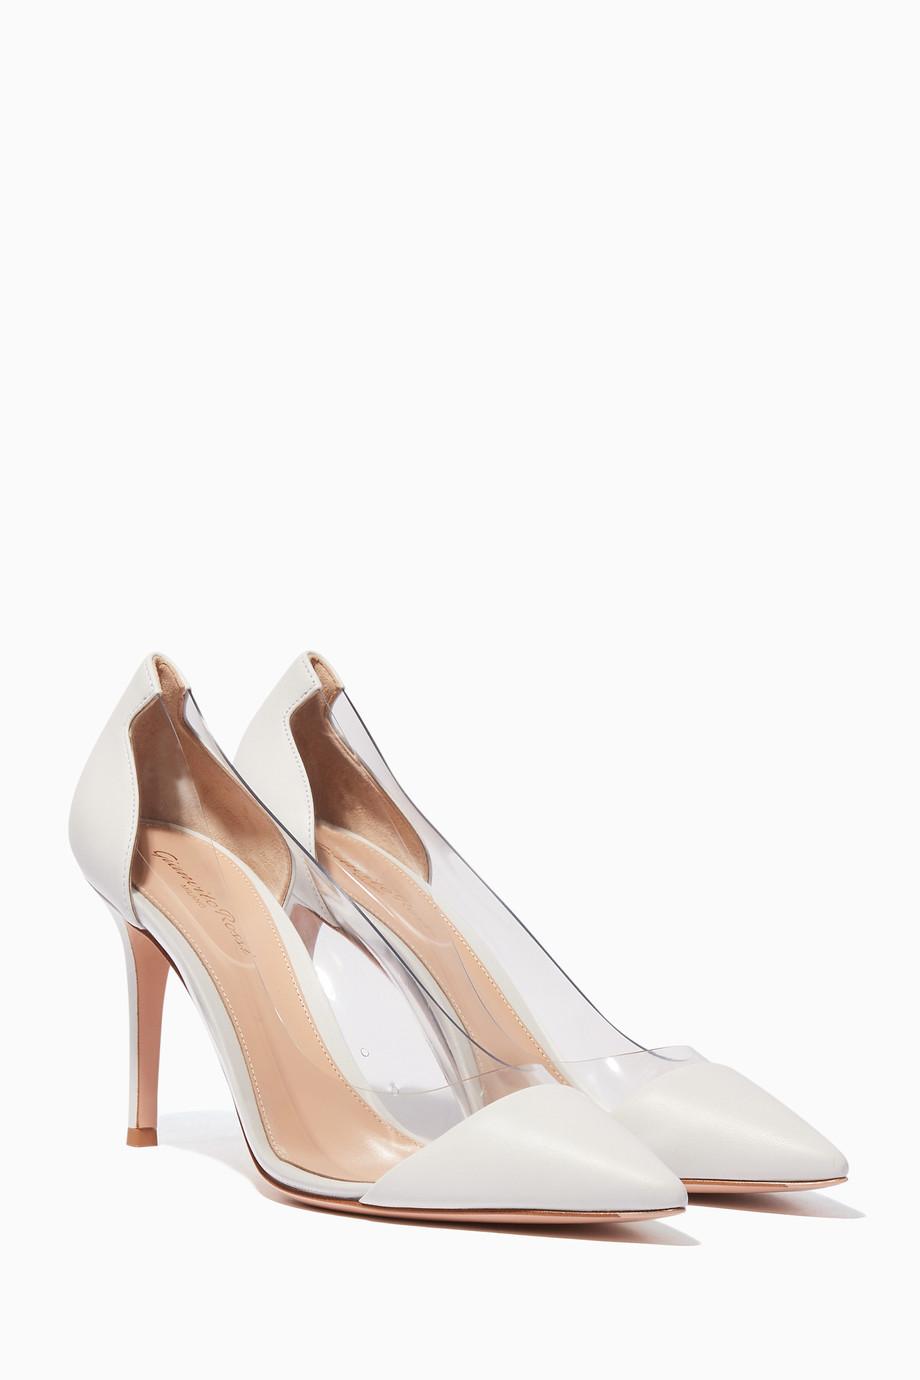 9e712eba6746c Shop Gianvito Rossi White White Nappa Plexi Pumps for Women | Ounass ...